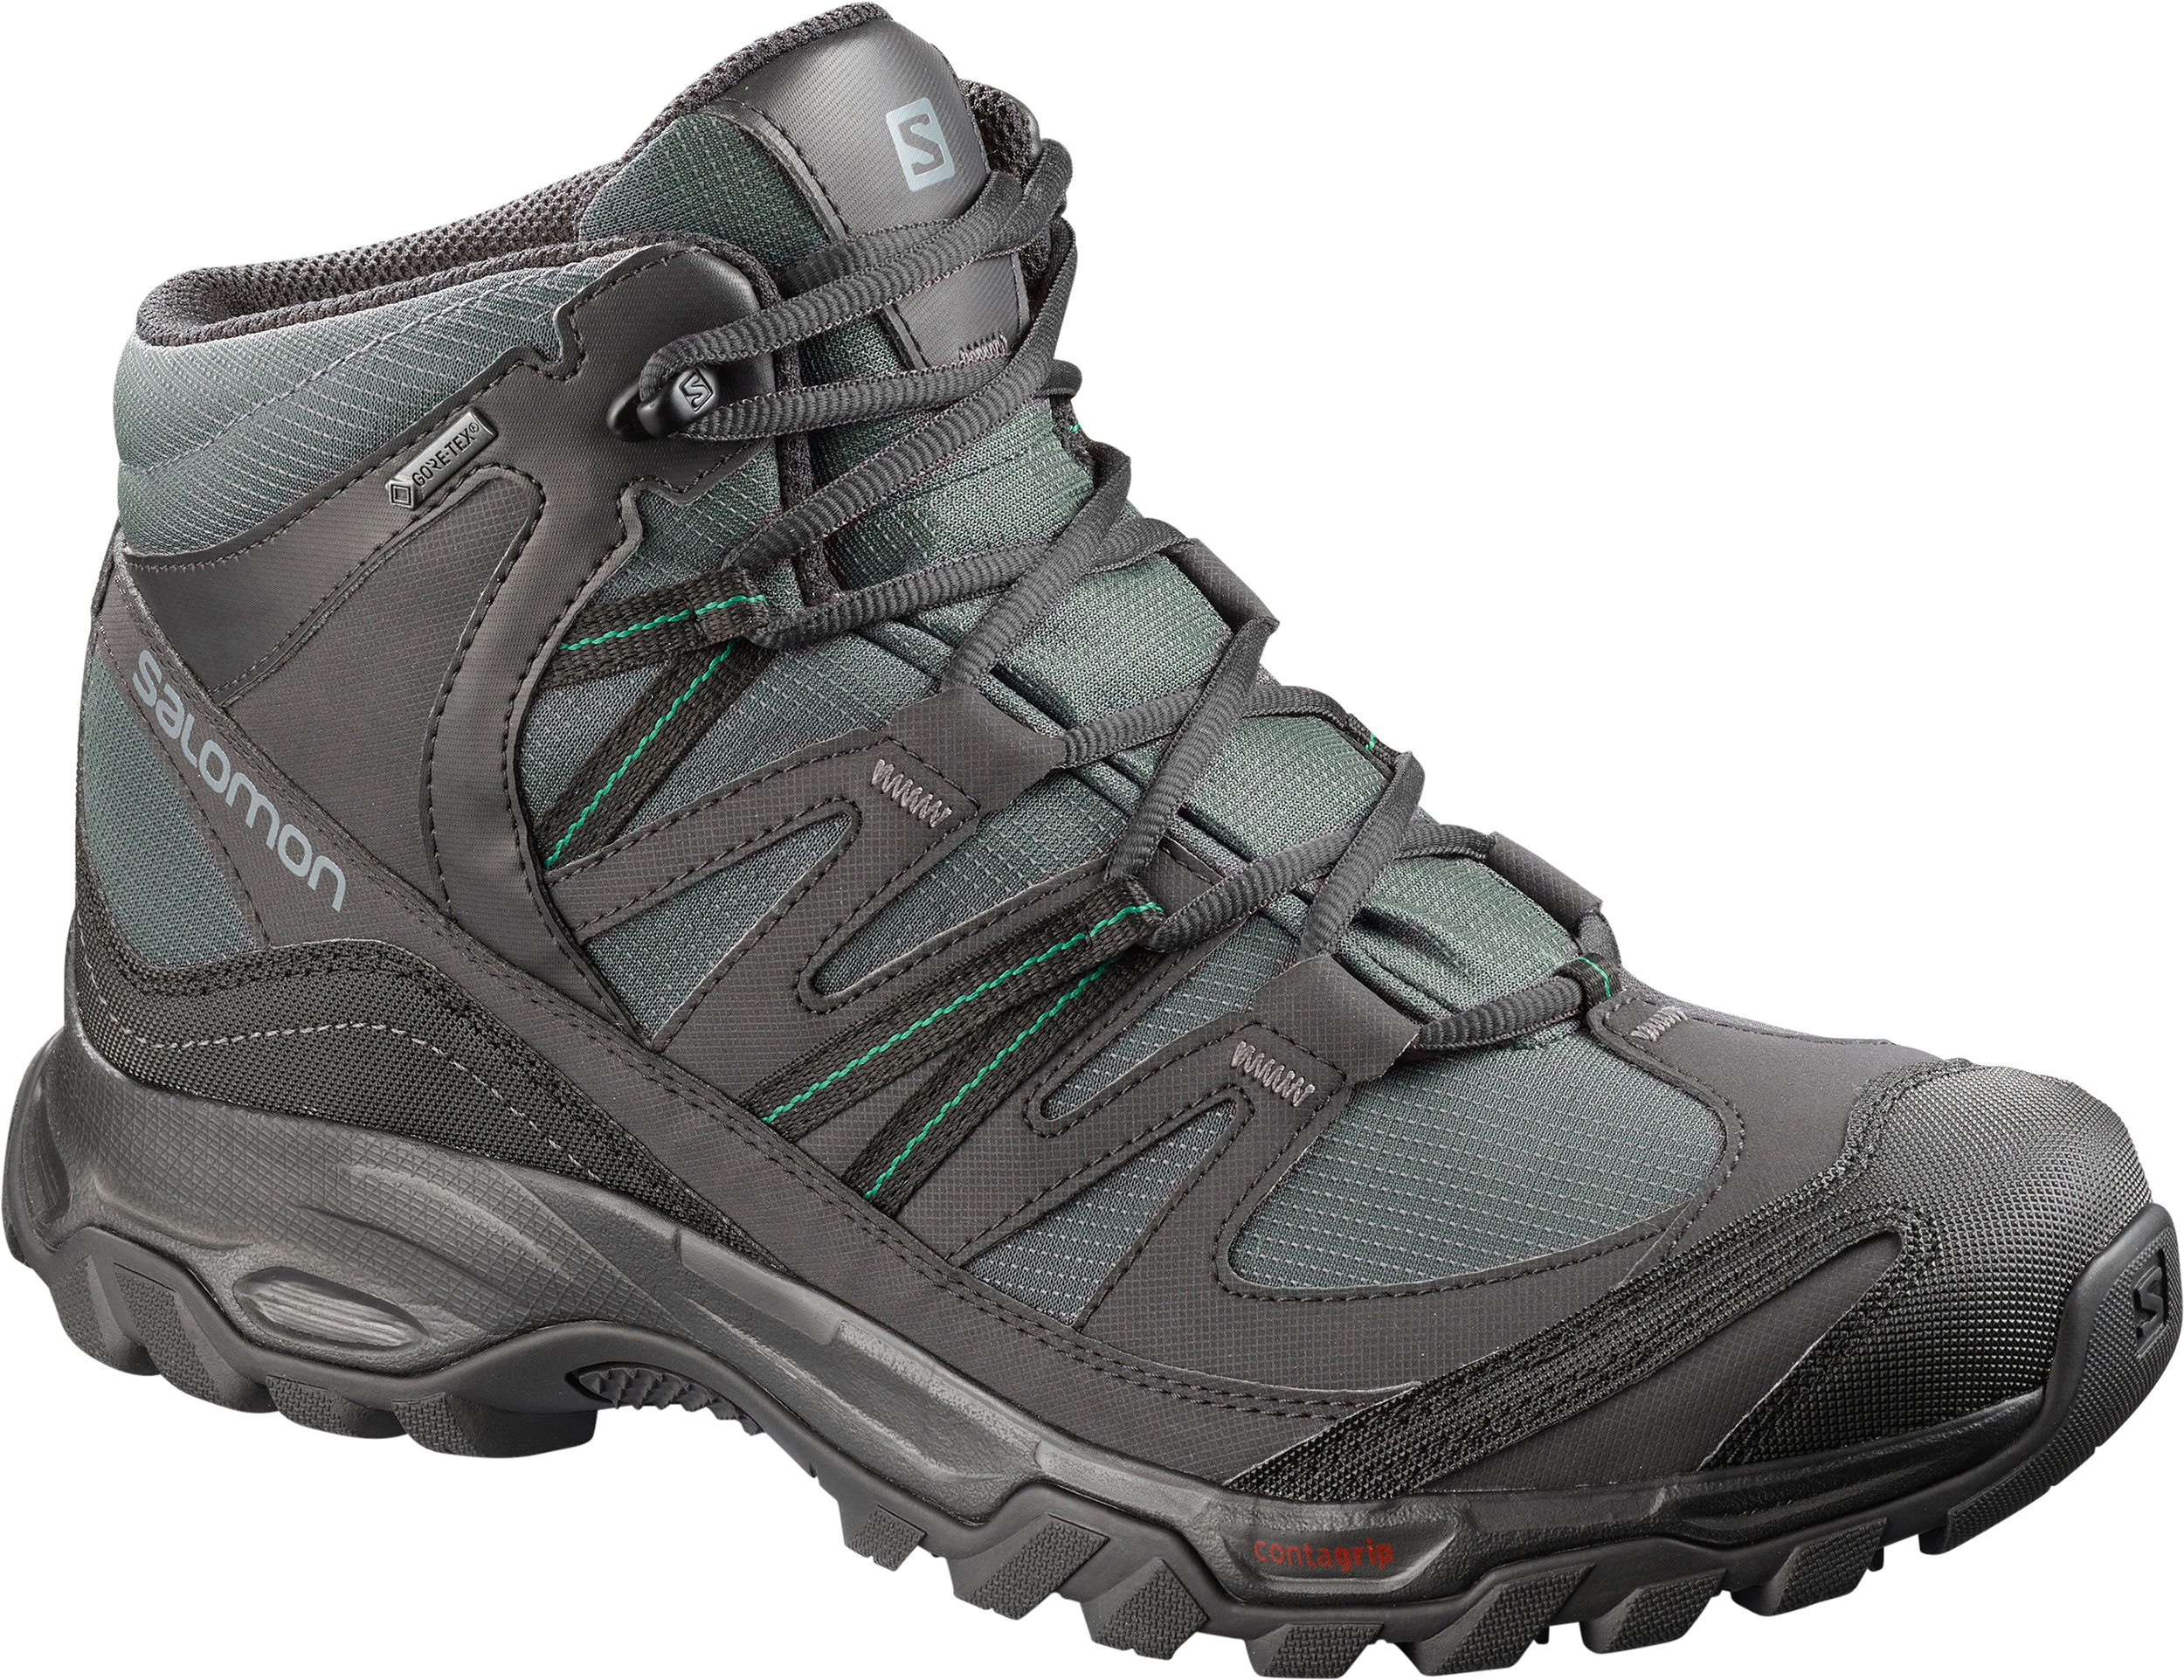 san francisco 0847c 67a02 Salomon Shindo Mid Gore-Tex Boots - Men's